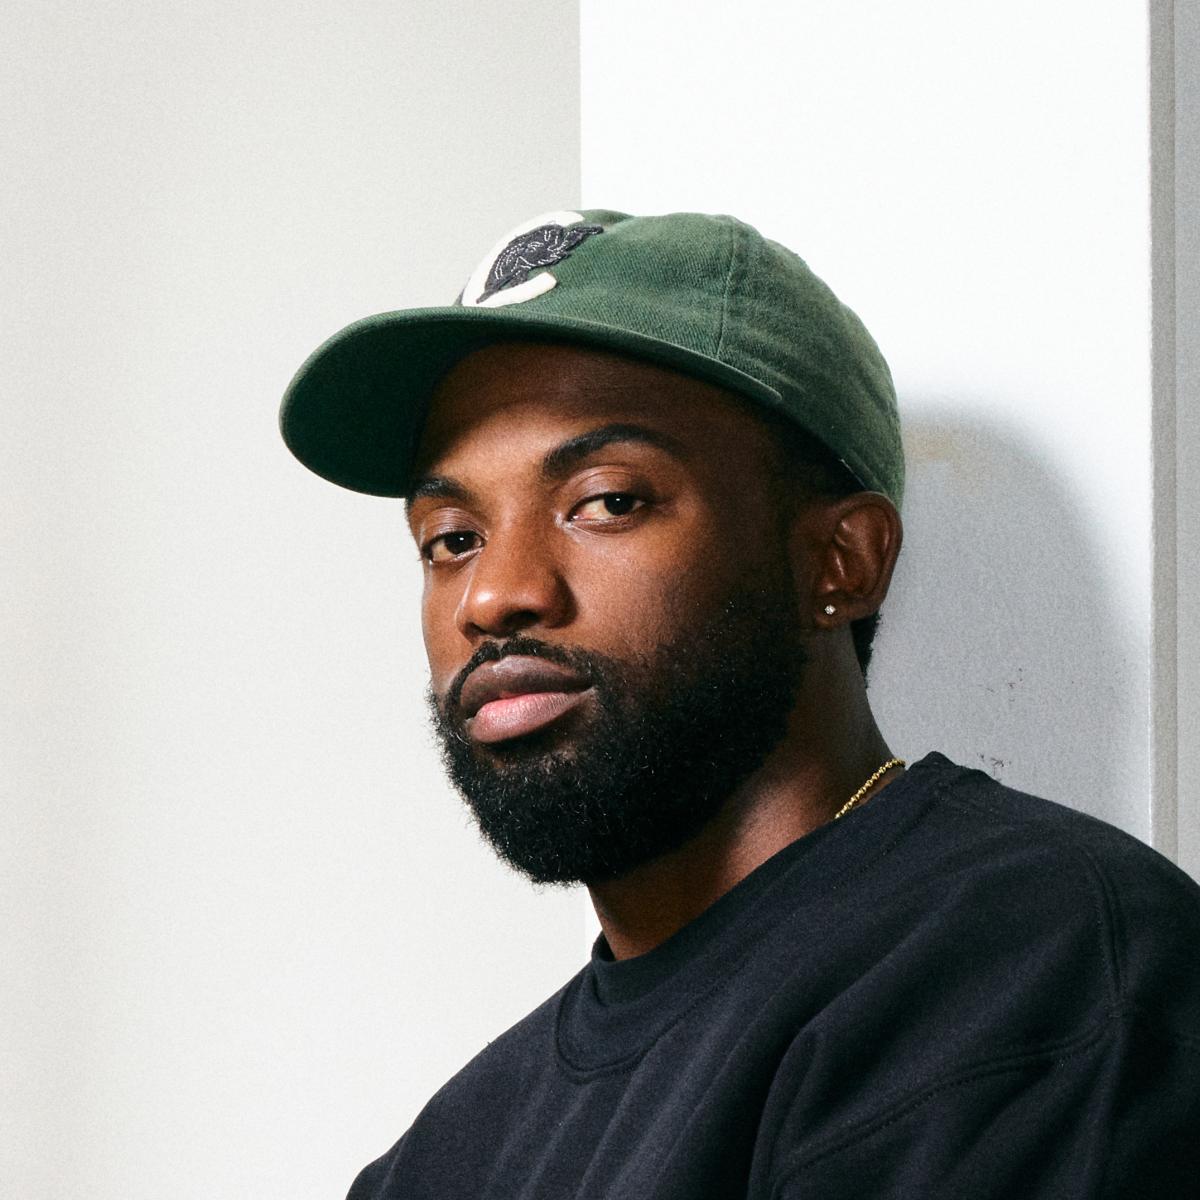 Photograph of a Black man- Sherrill Roland- with a beard wearing a dark sweatshirt and a green baseball cap.